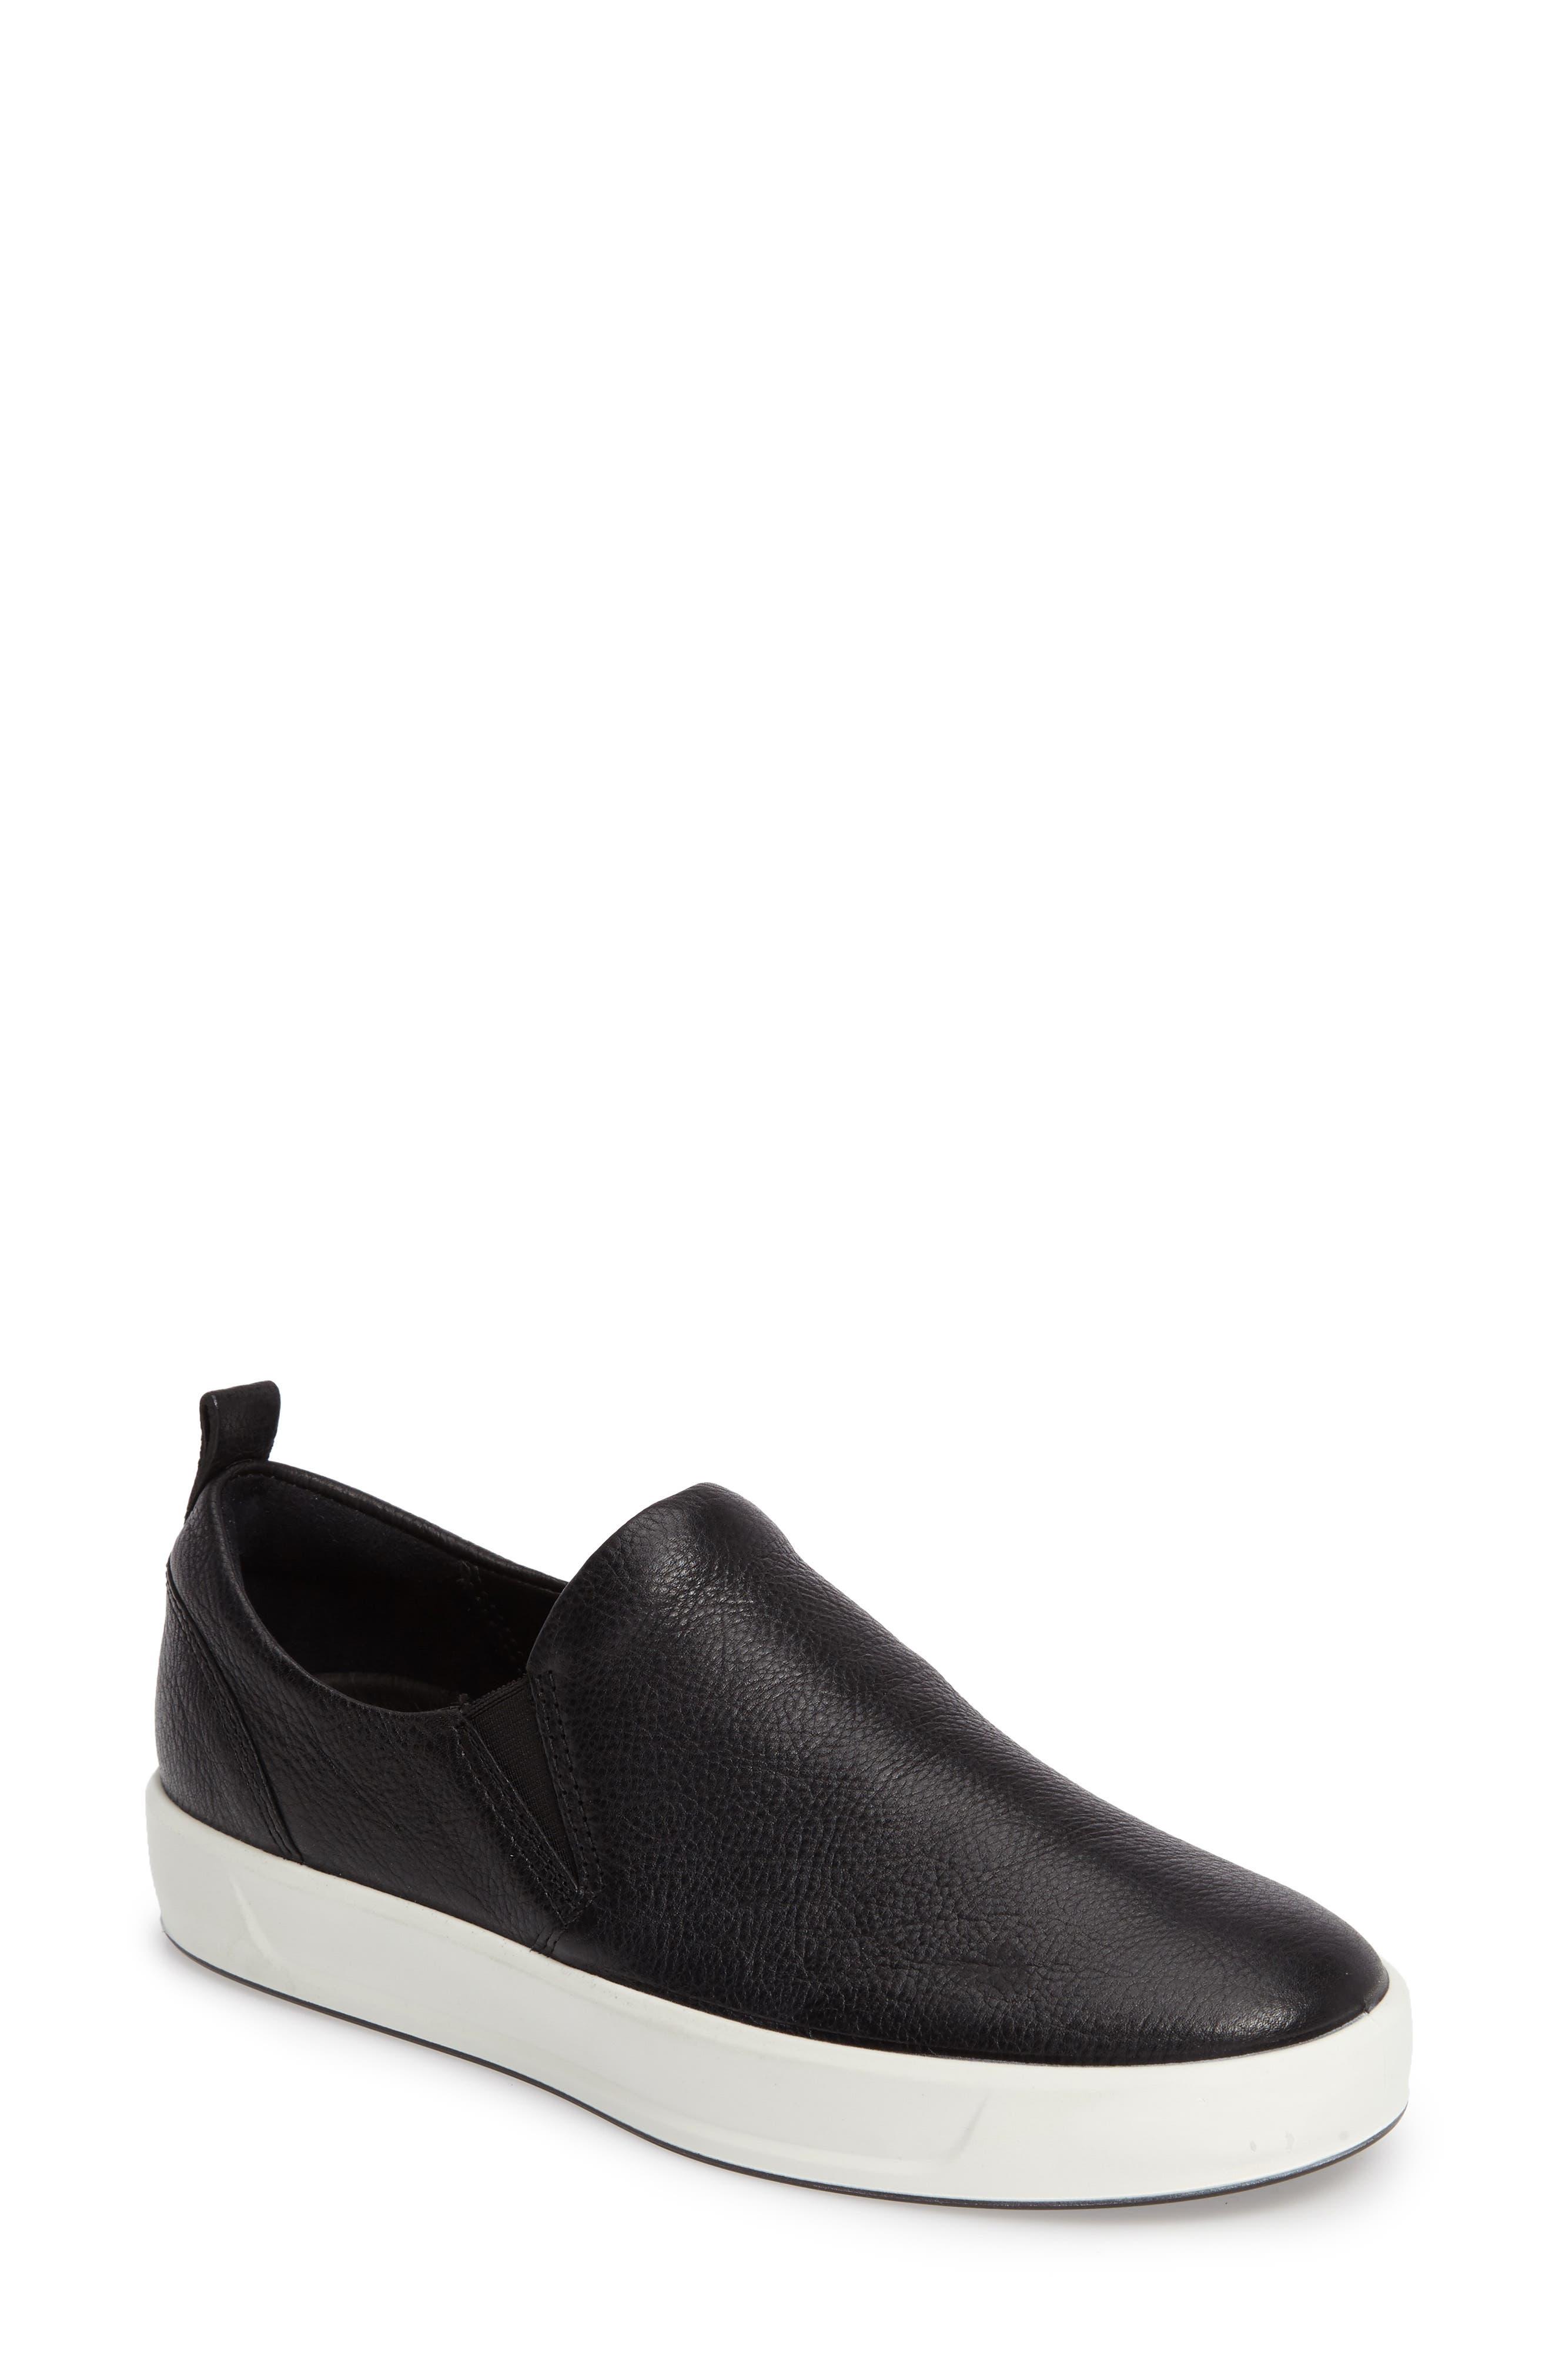 Main Image - ECCO Soft 8 Slip-On Sneaker (Women)